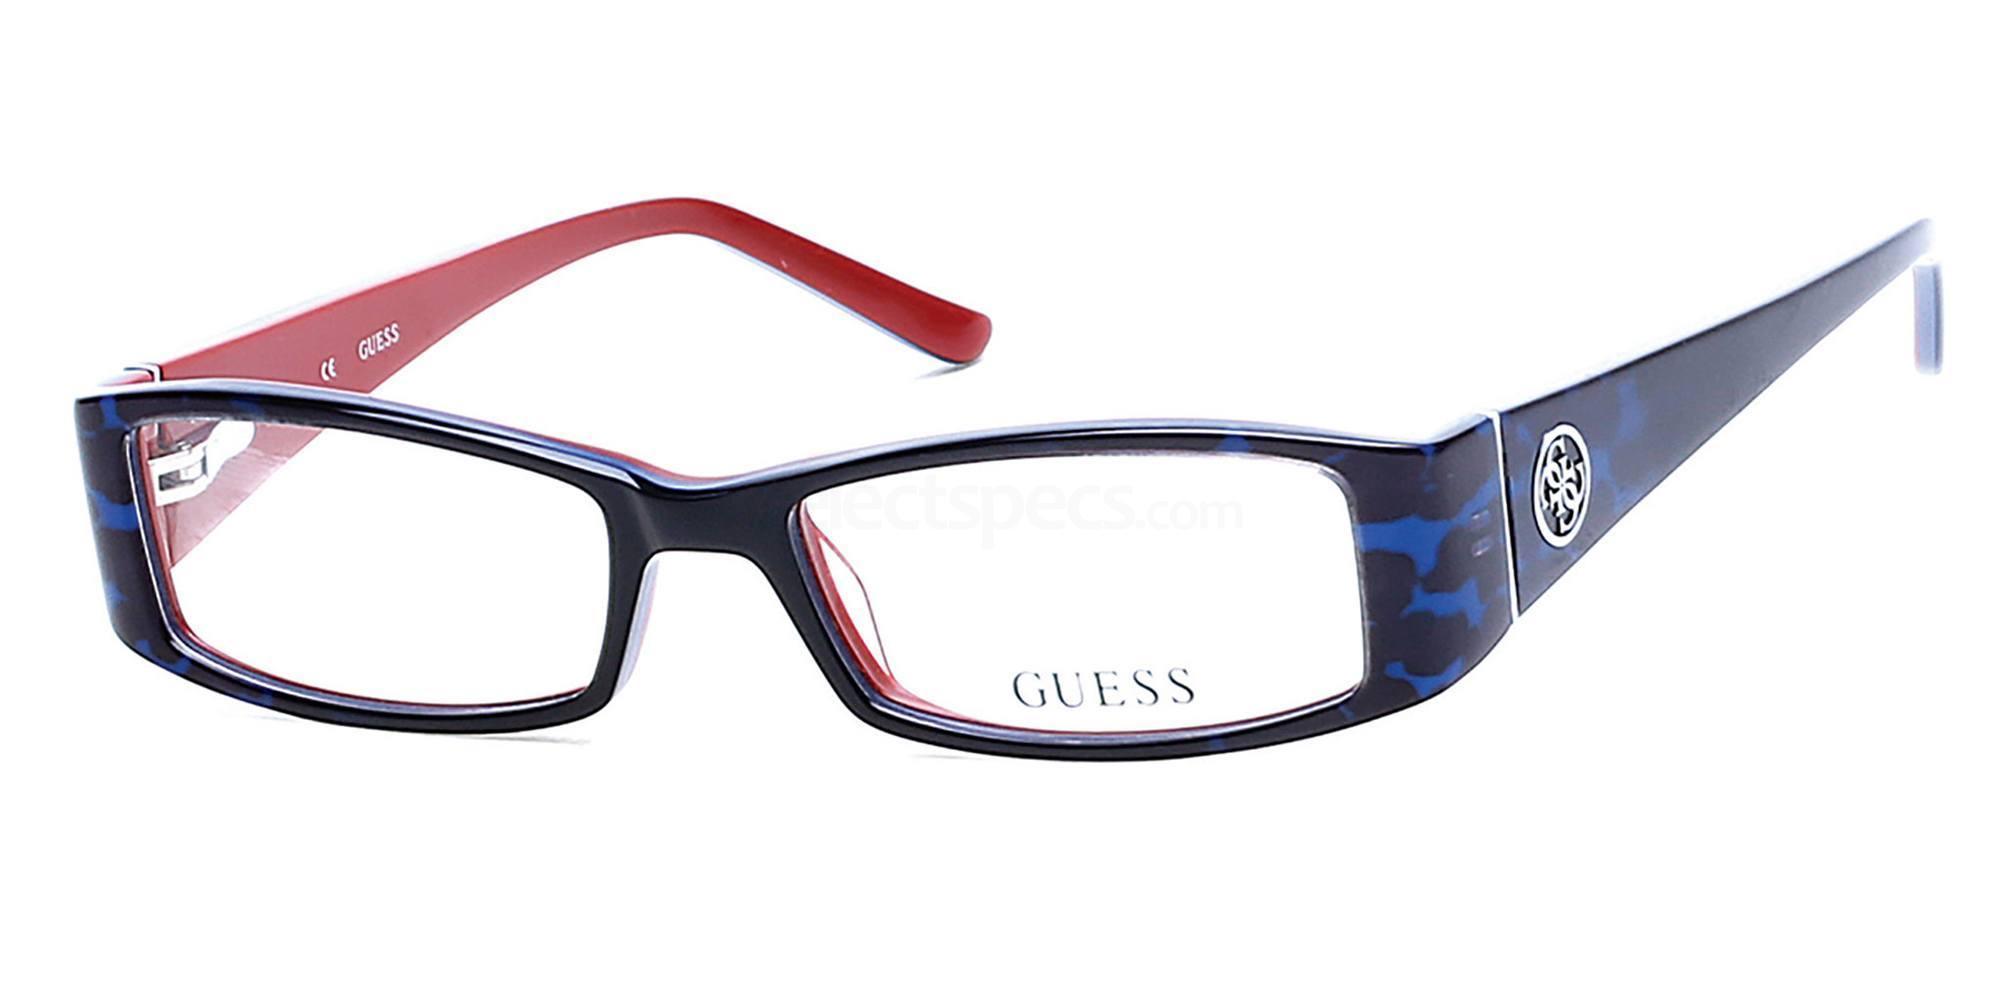 092 GU2537 Glasses, Guess